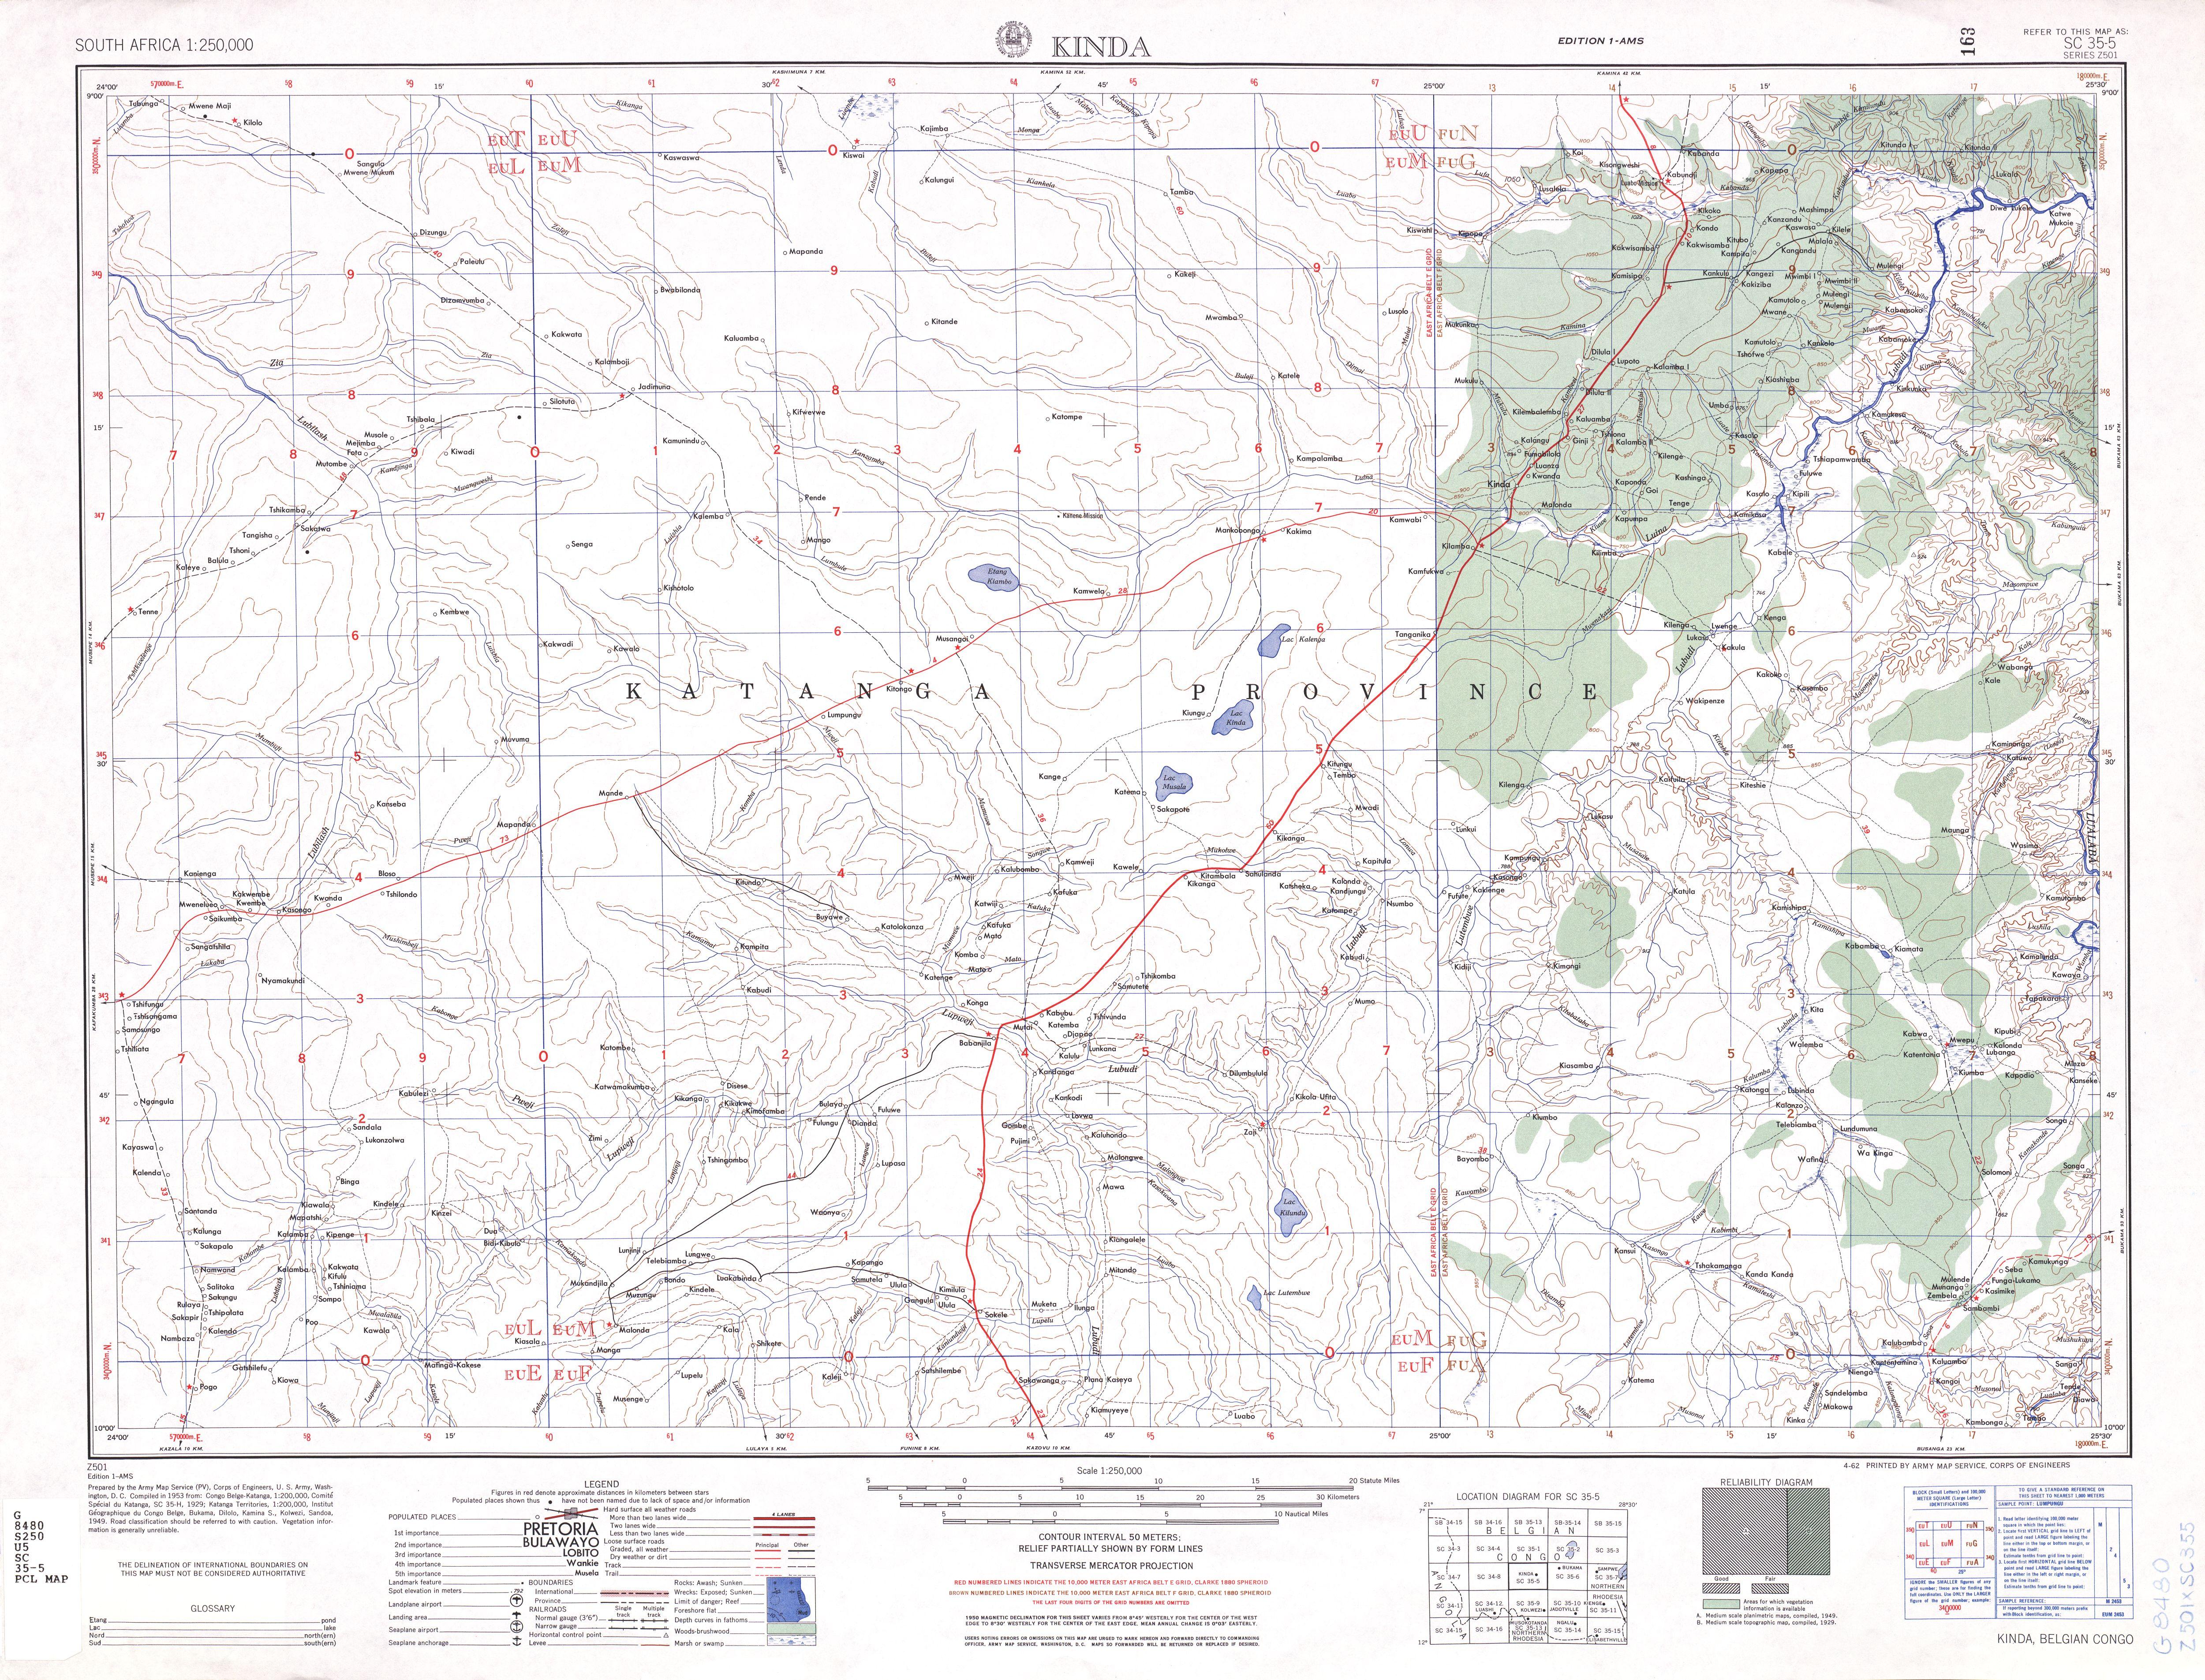 Hoja Kinda del Mapa Topográfico de África Meridional 1954